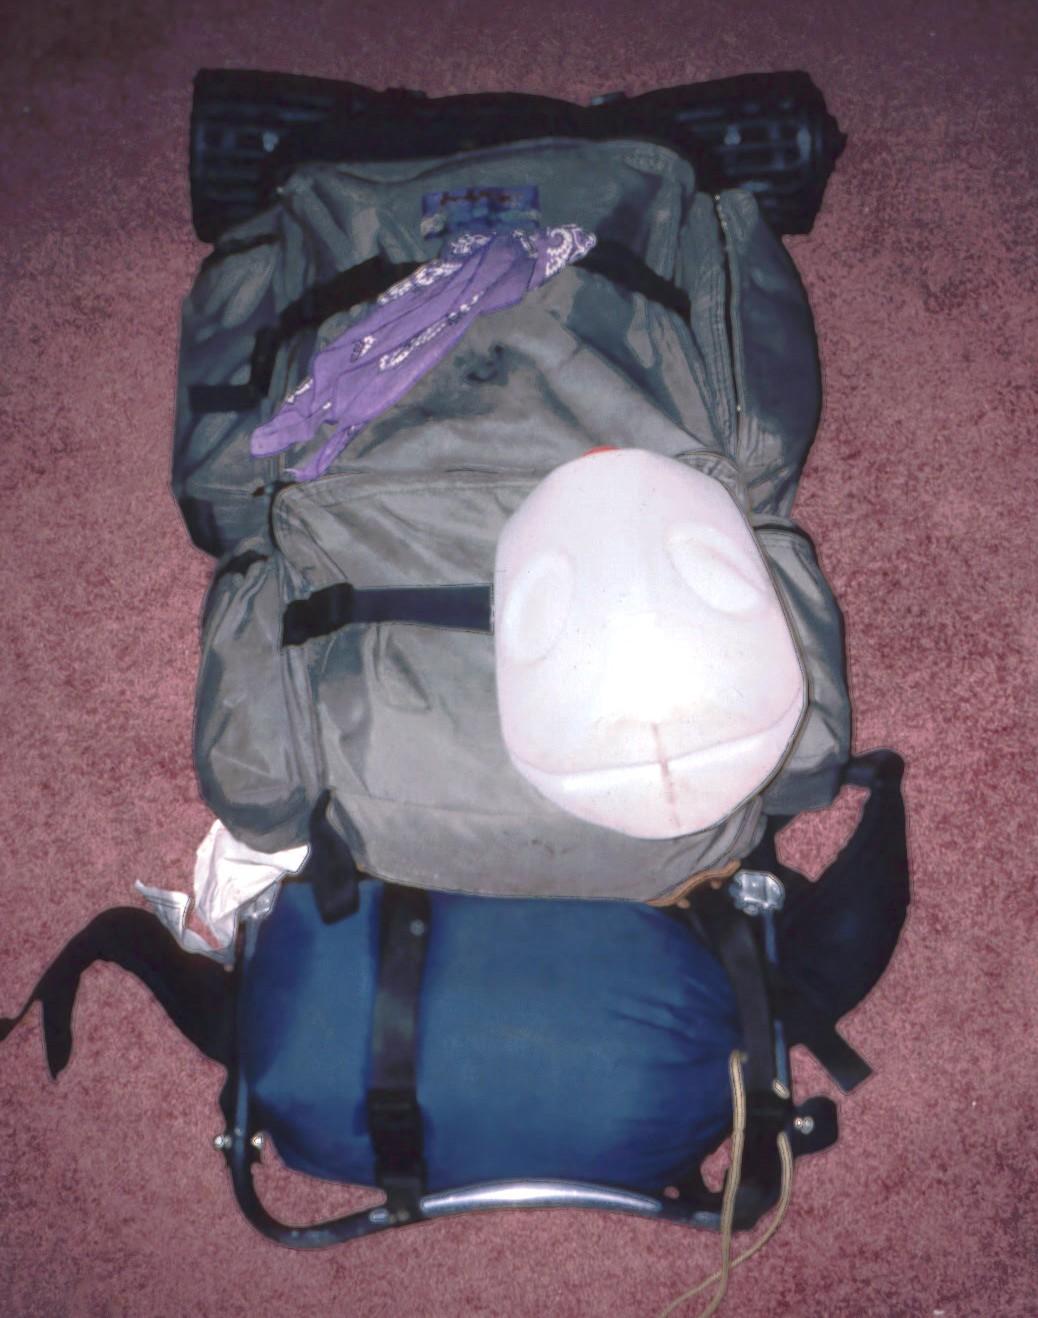 AT 1988 equipment assembled